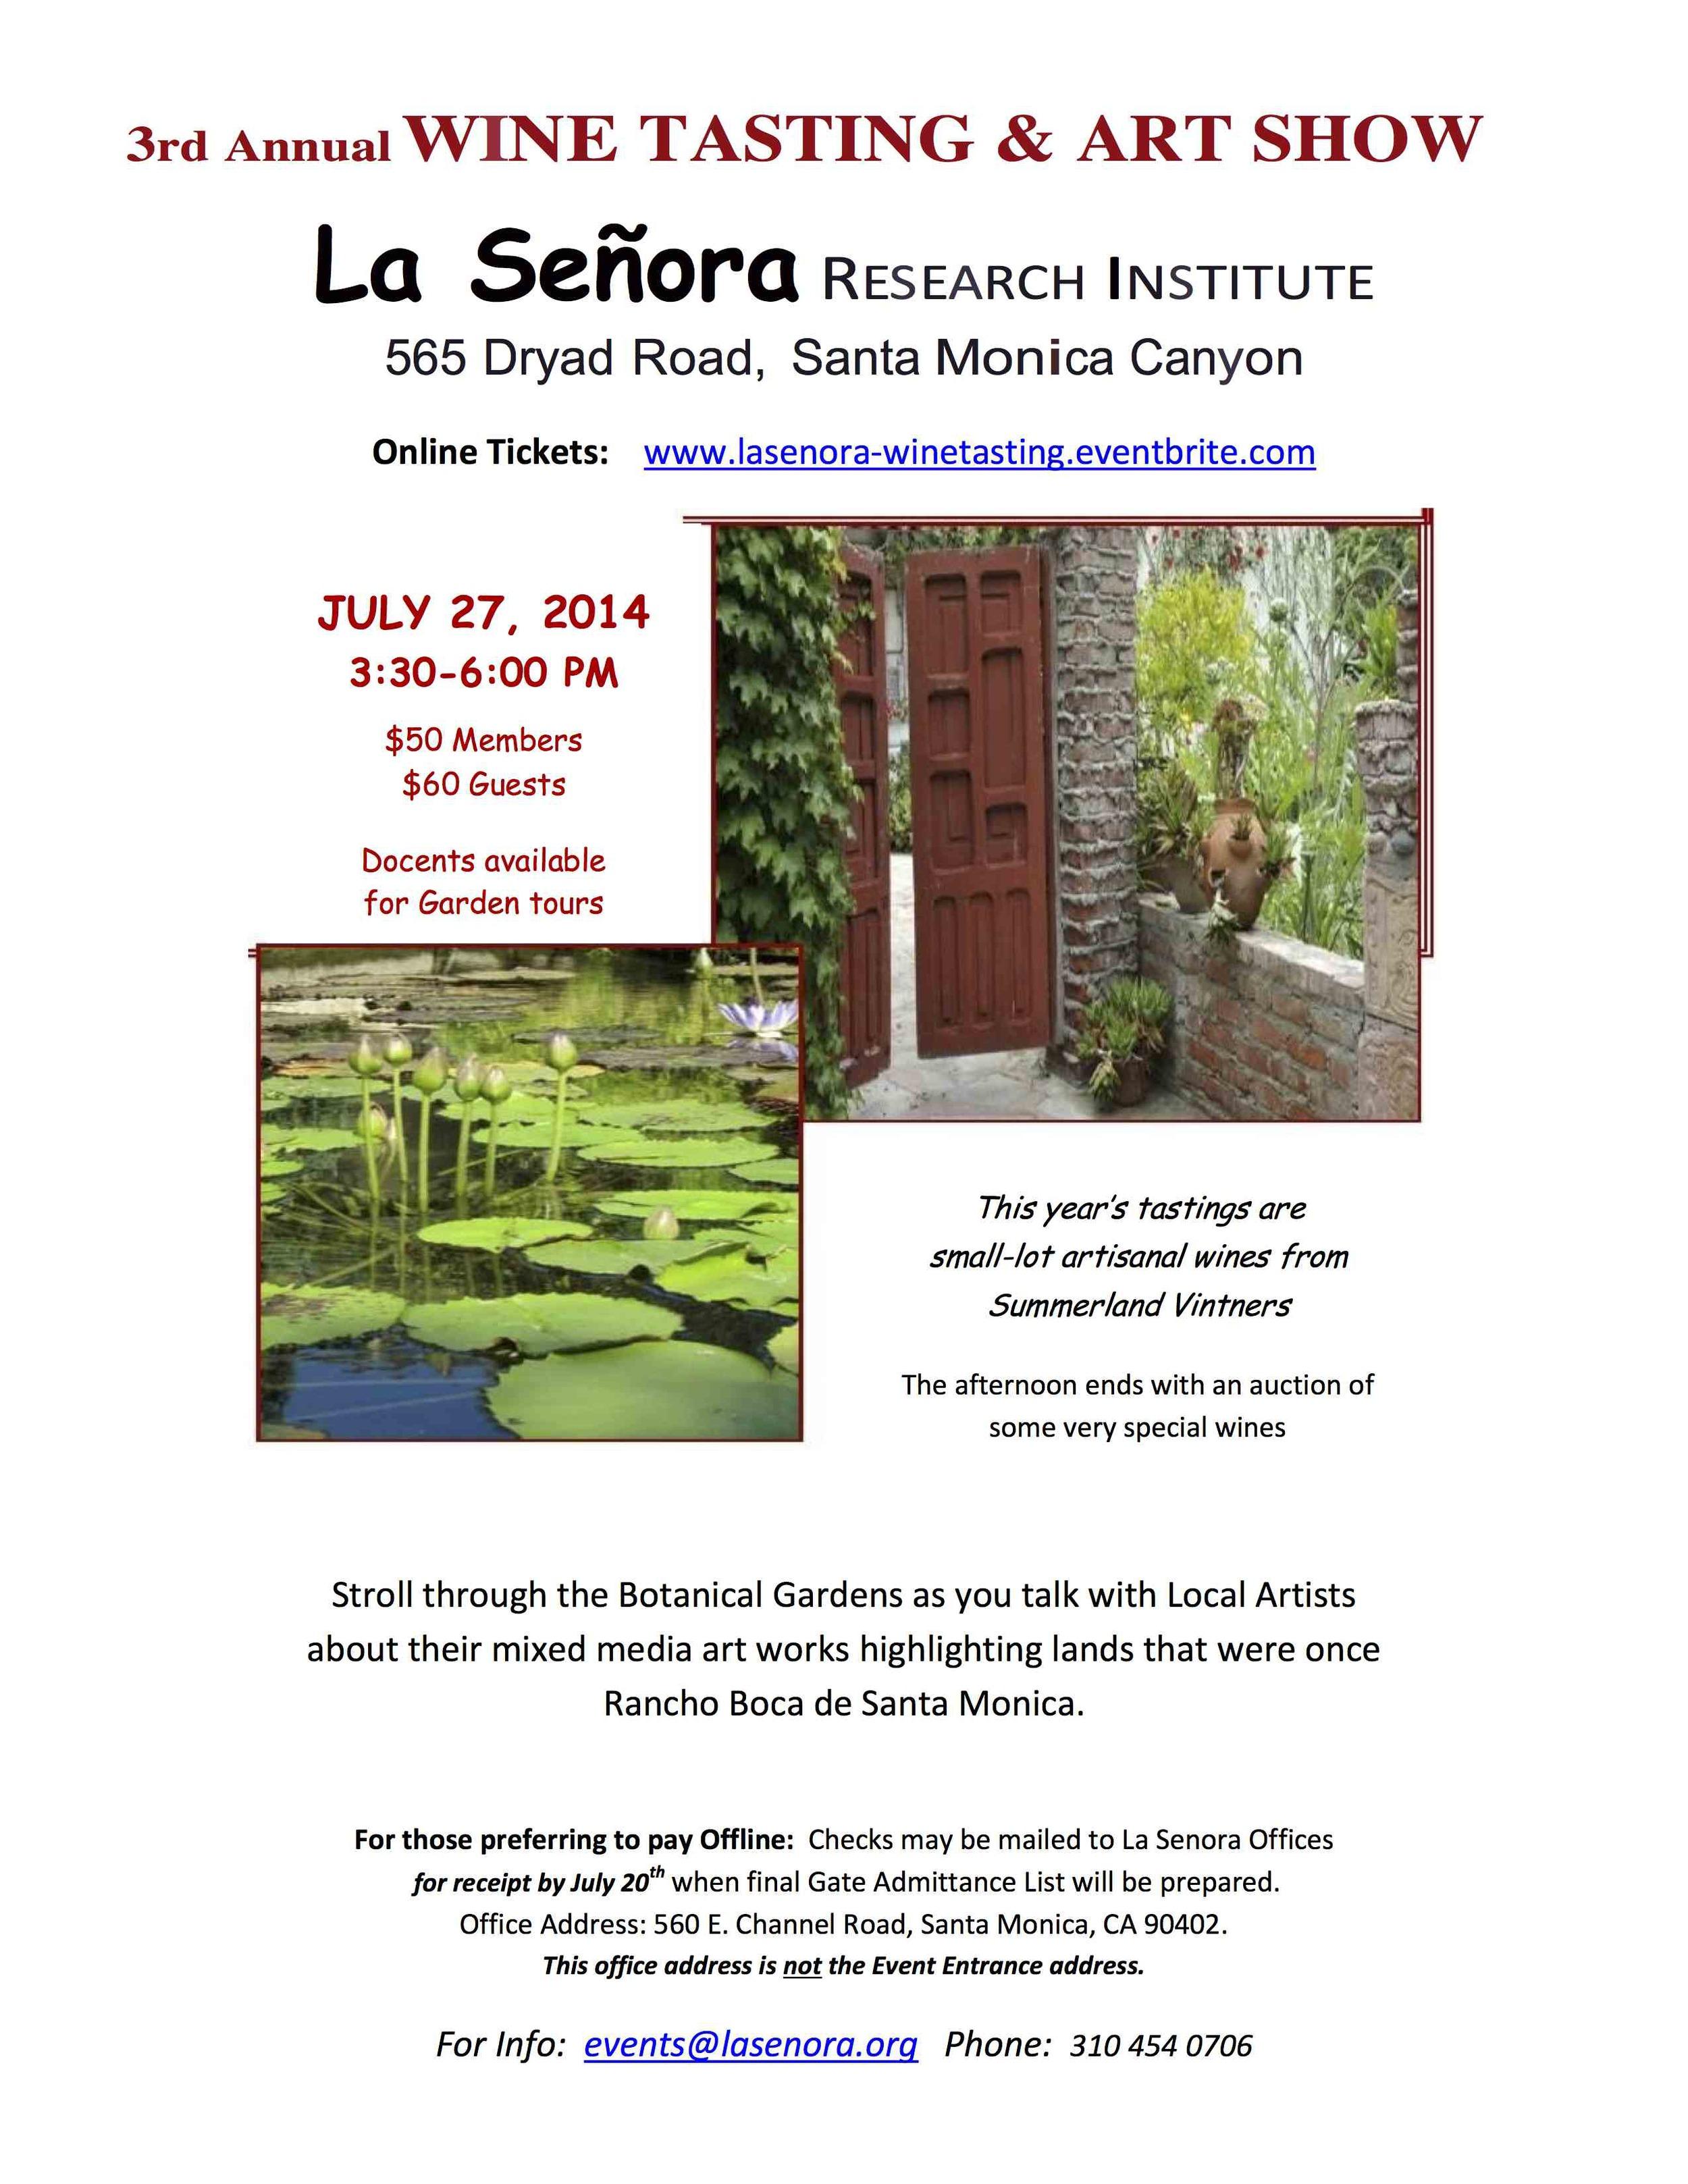 3rd Annual Wine Tasting & Art Show in the Gardens Tickets, Santa Monica - Eventbrite